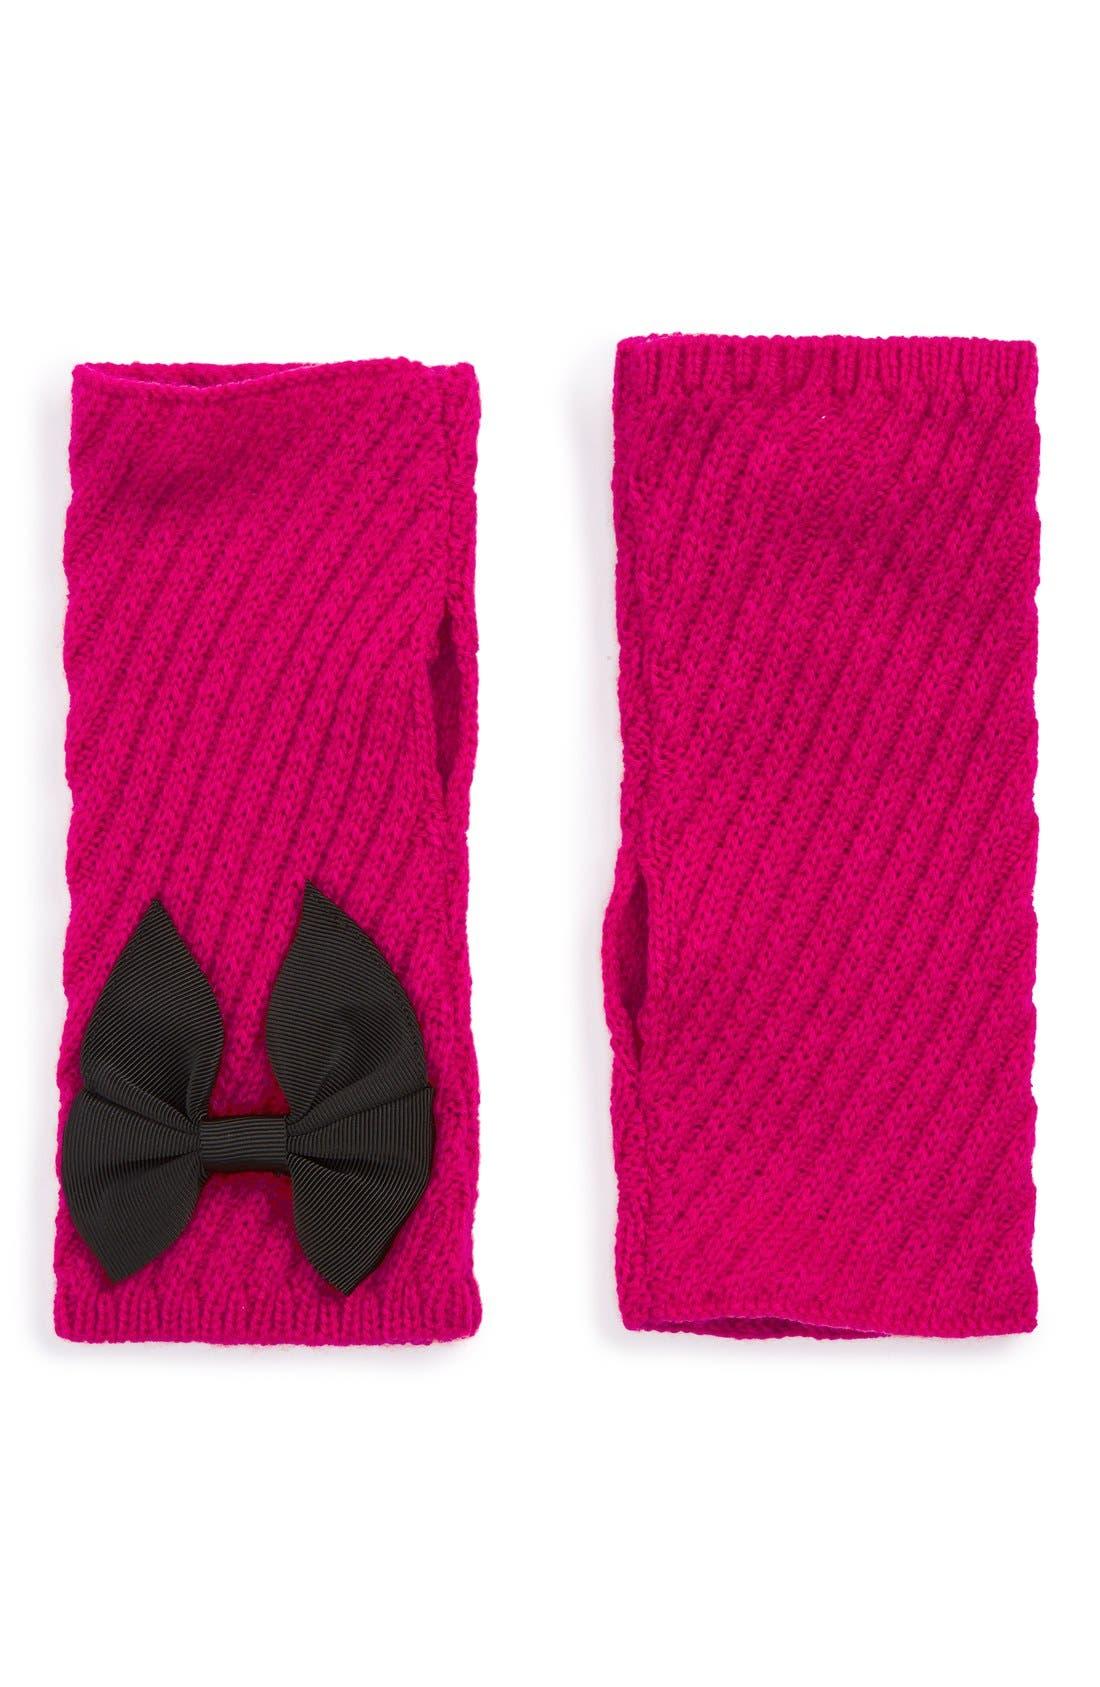 Alternate Image 1 Selected - kate spade new york rib knit arm warmers